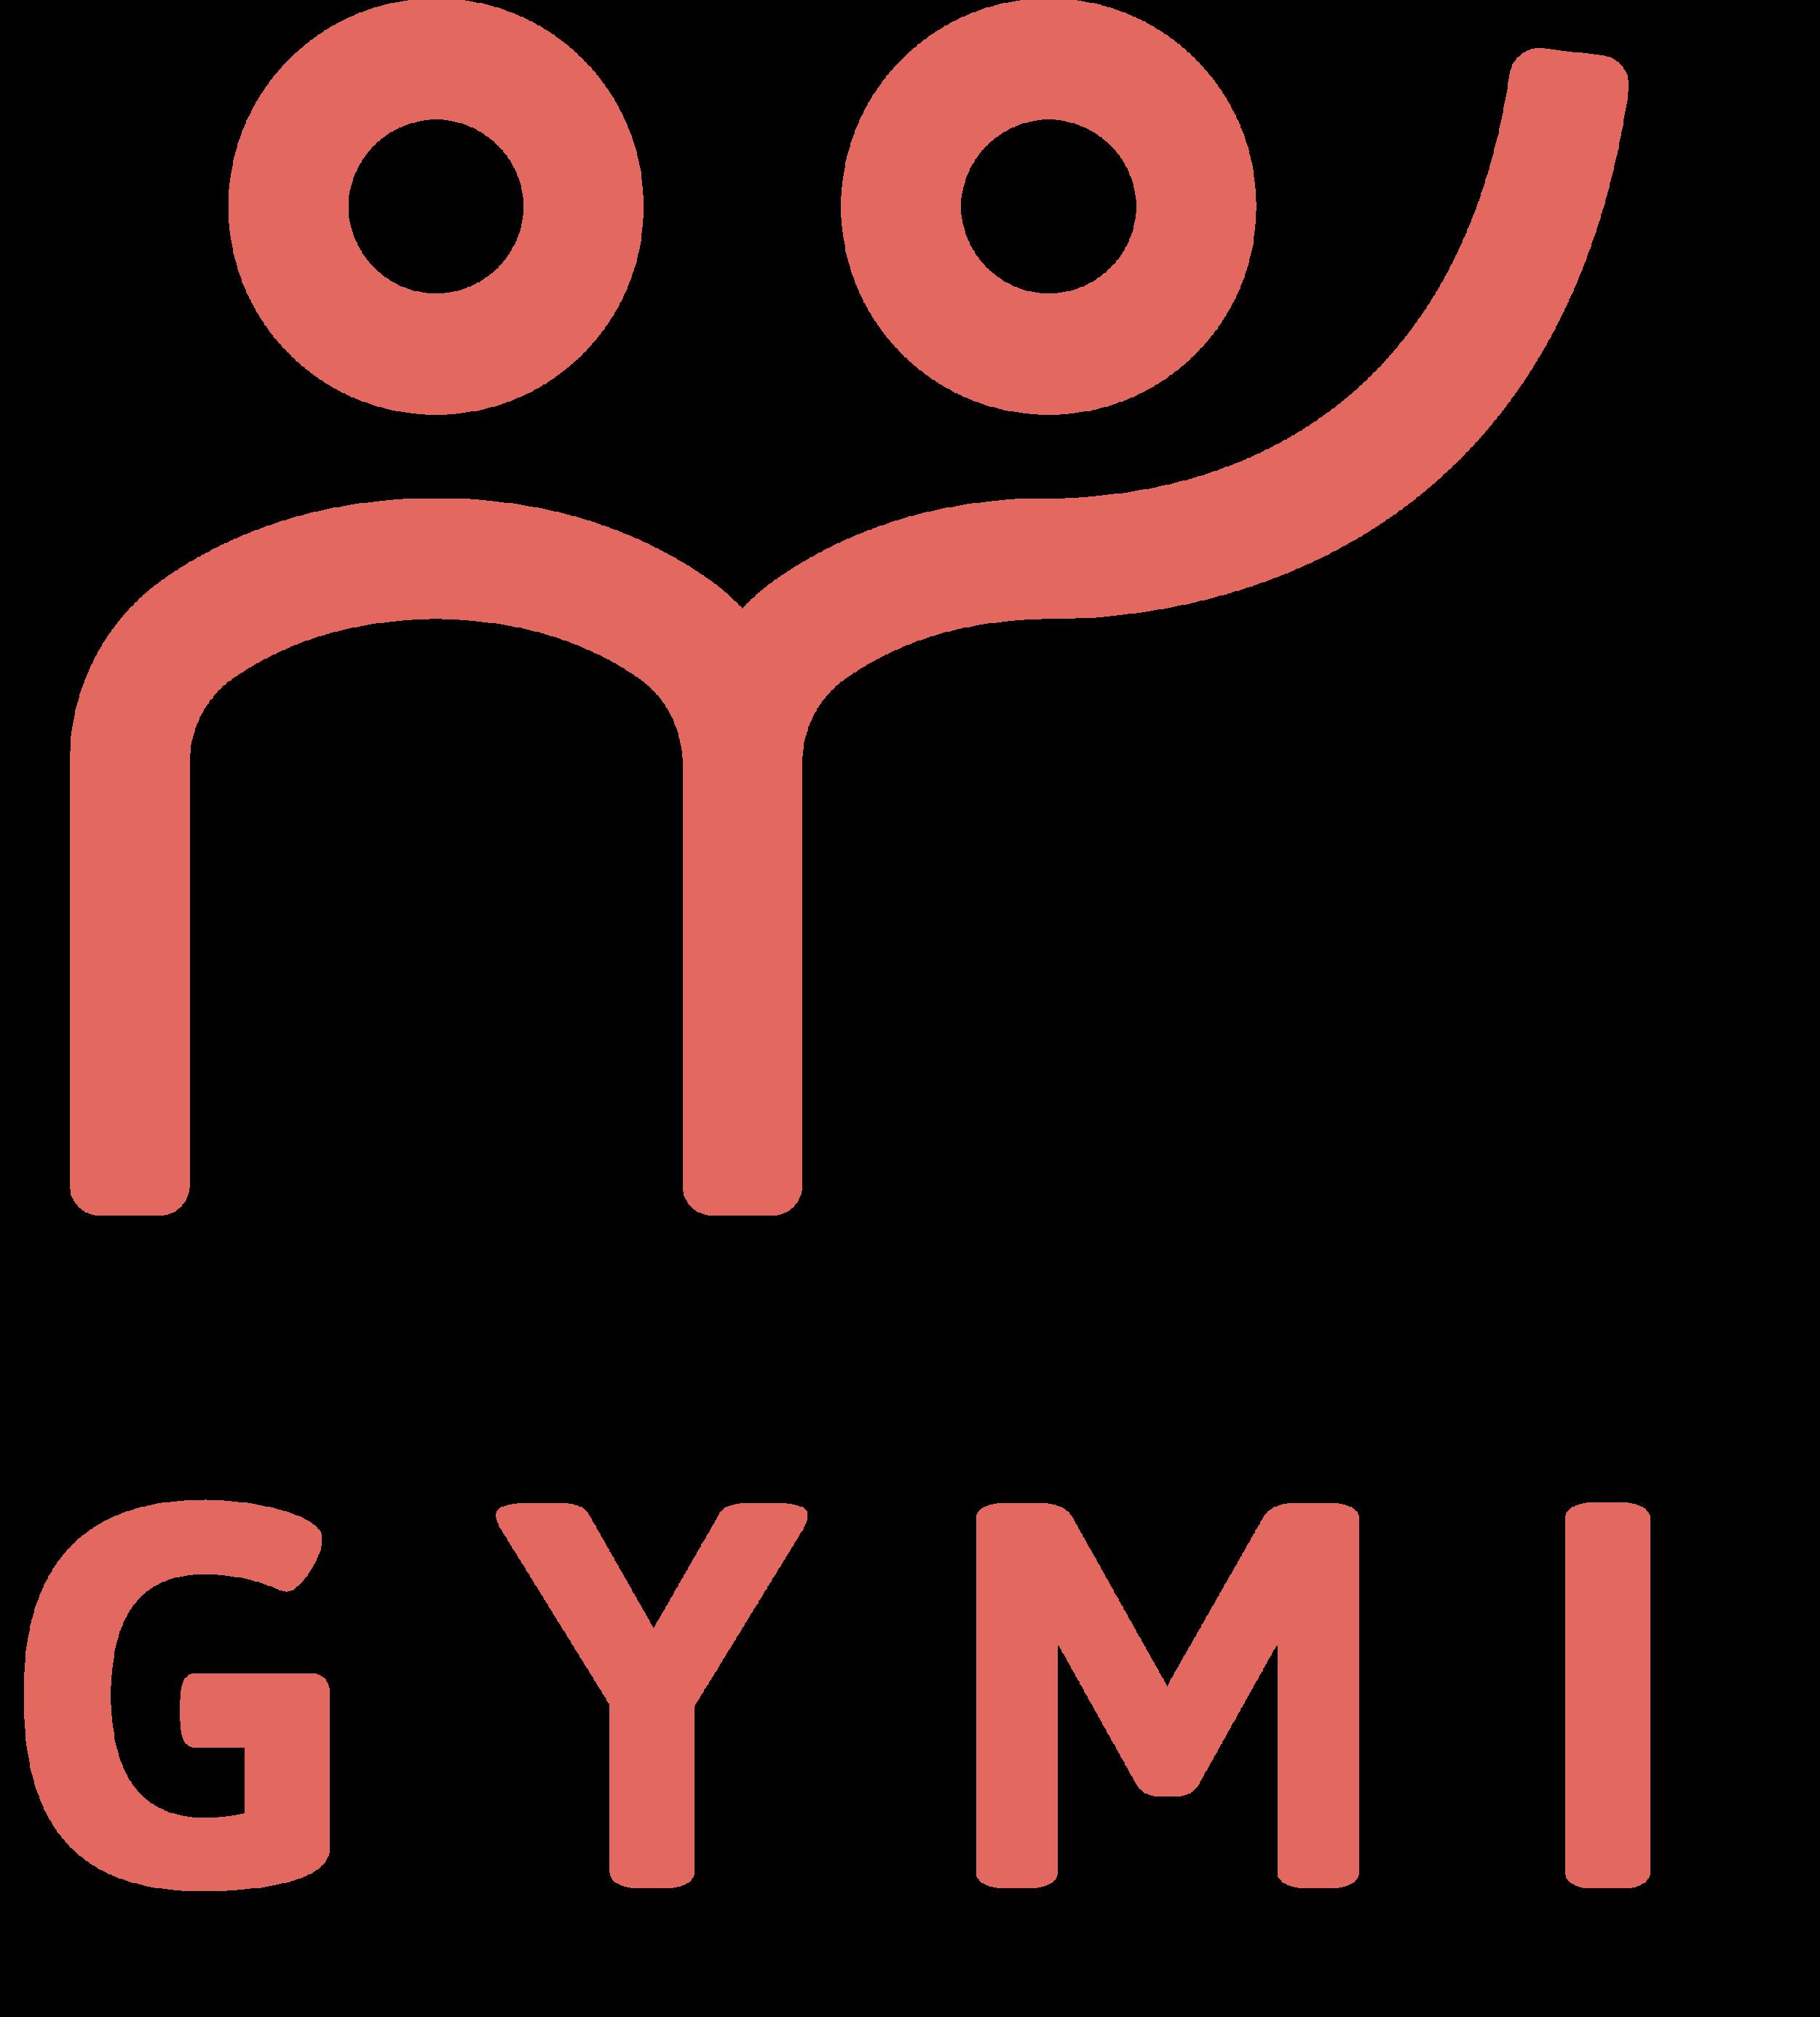 gymilogo1.png